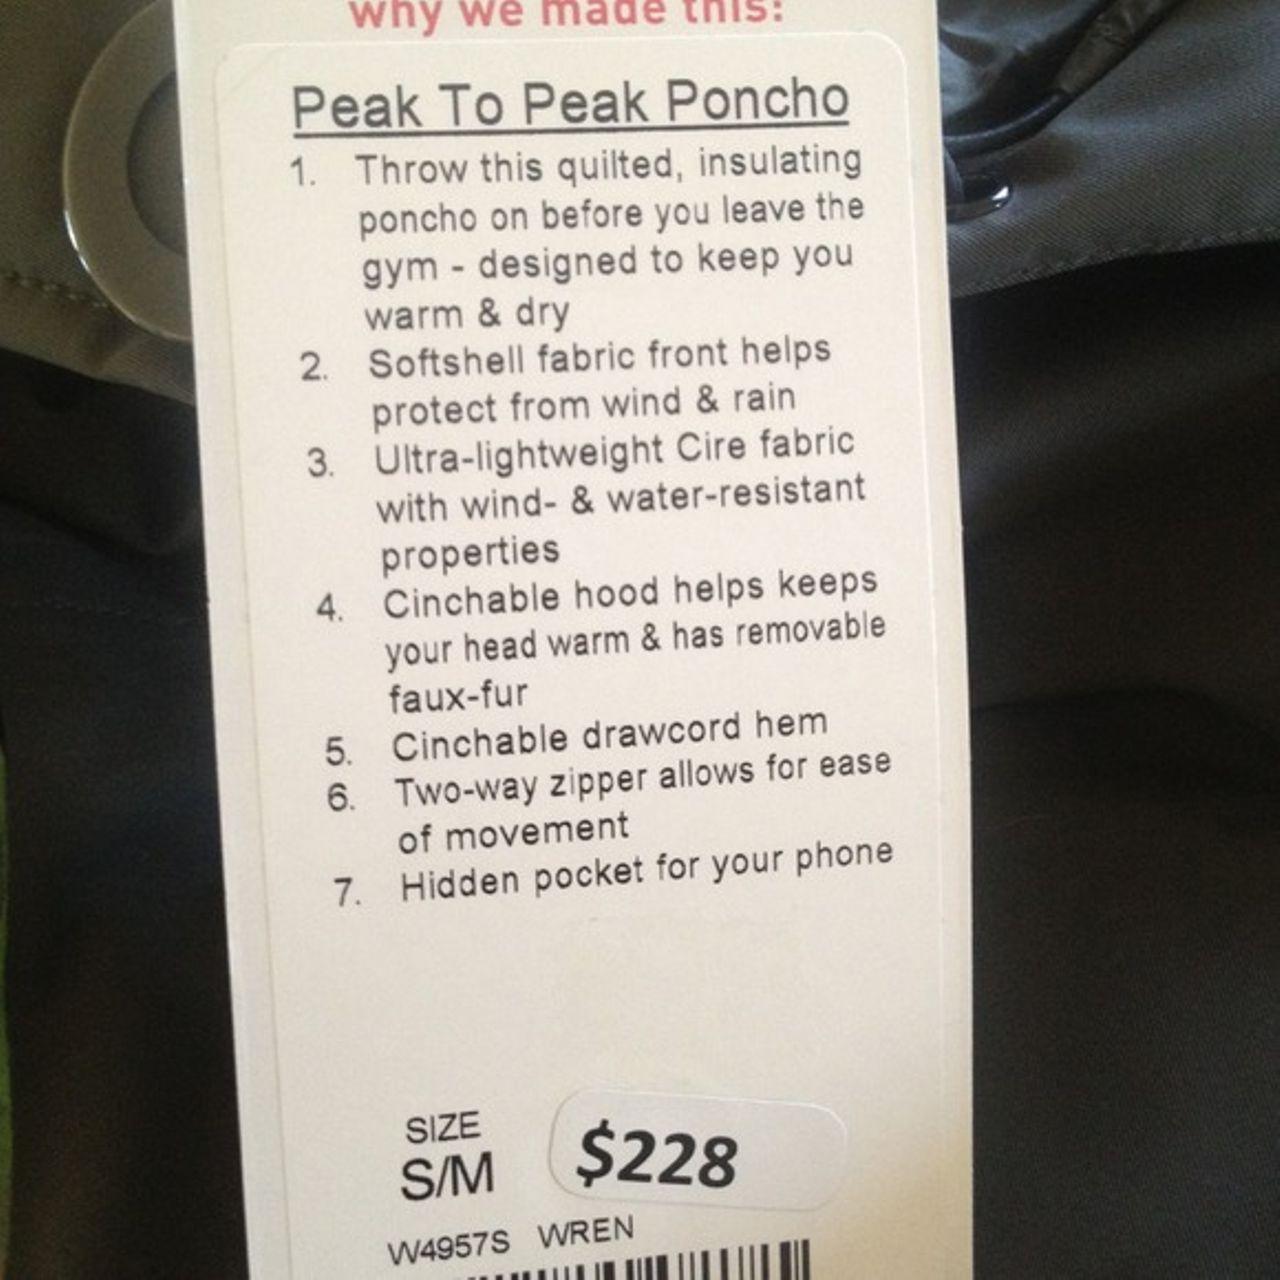 Lululemon Peak To Peak Poncho - Wren